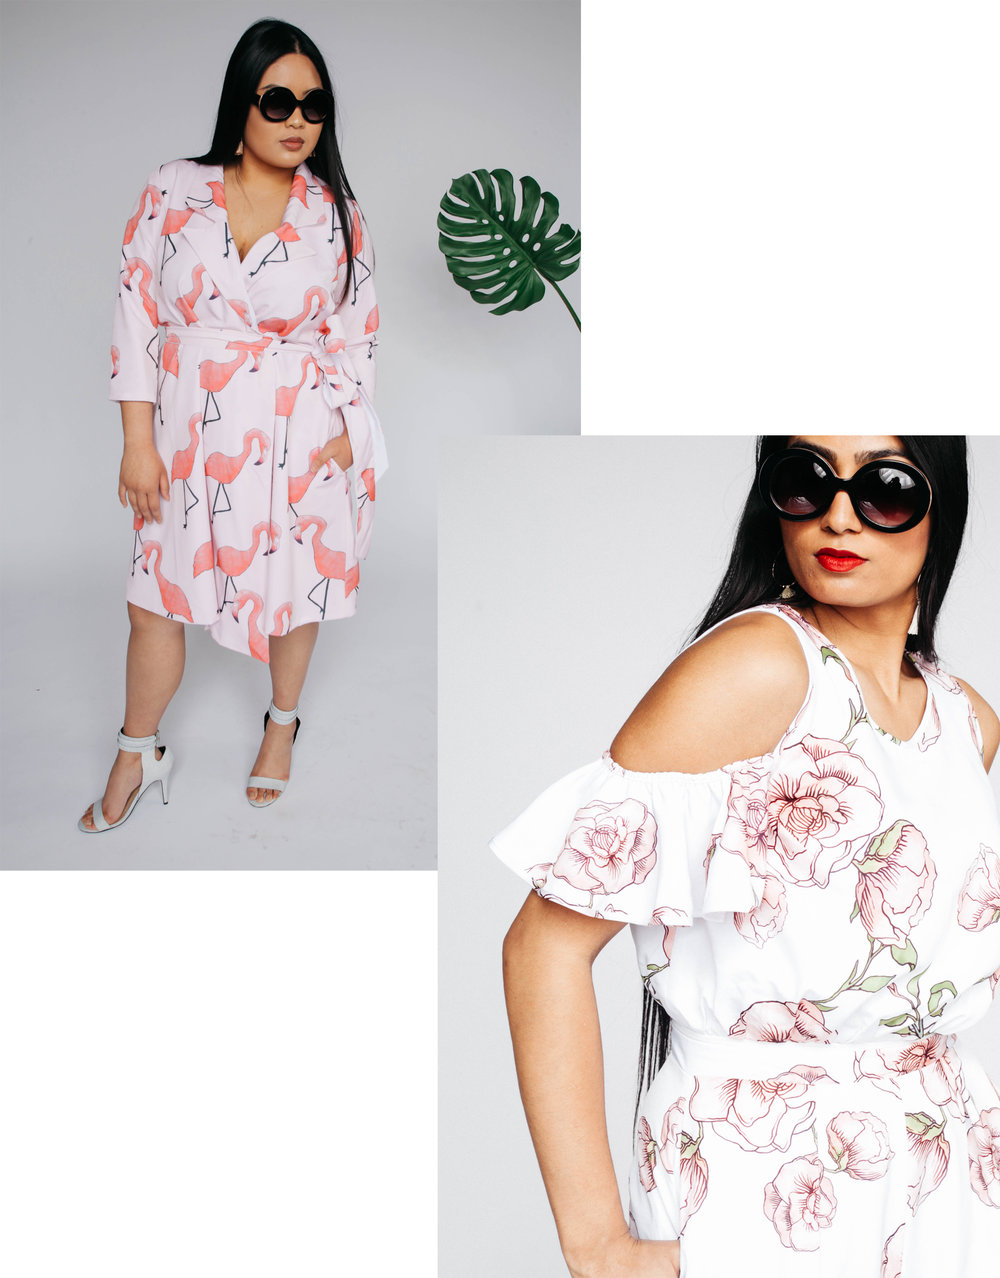 dona paula 2017 carolyn tripp fashion textile.jpg